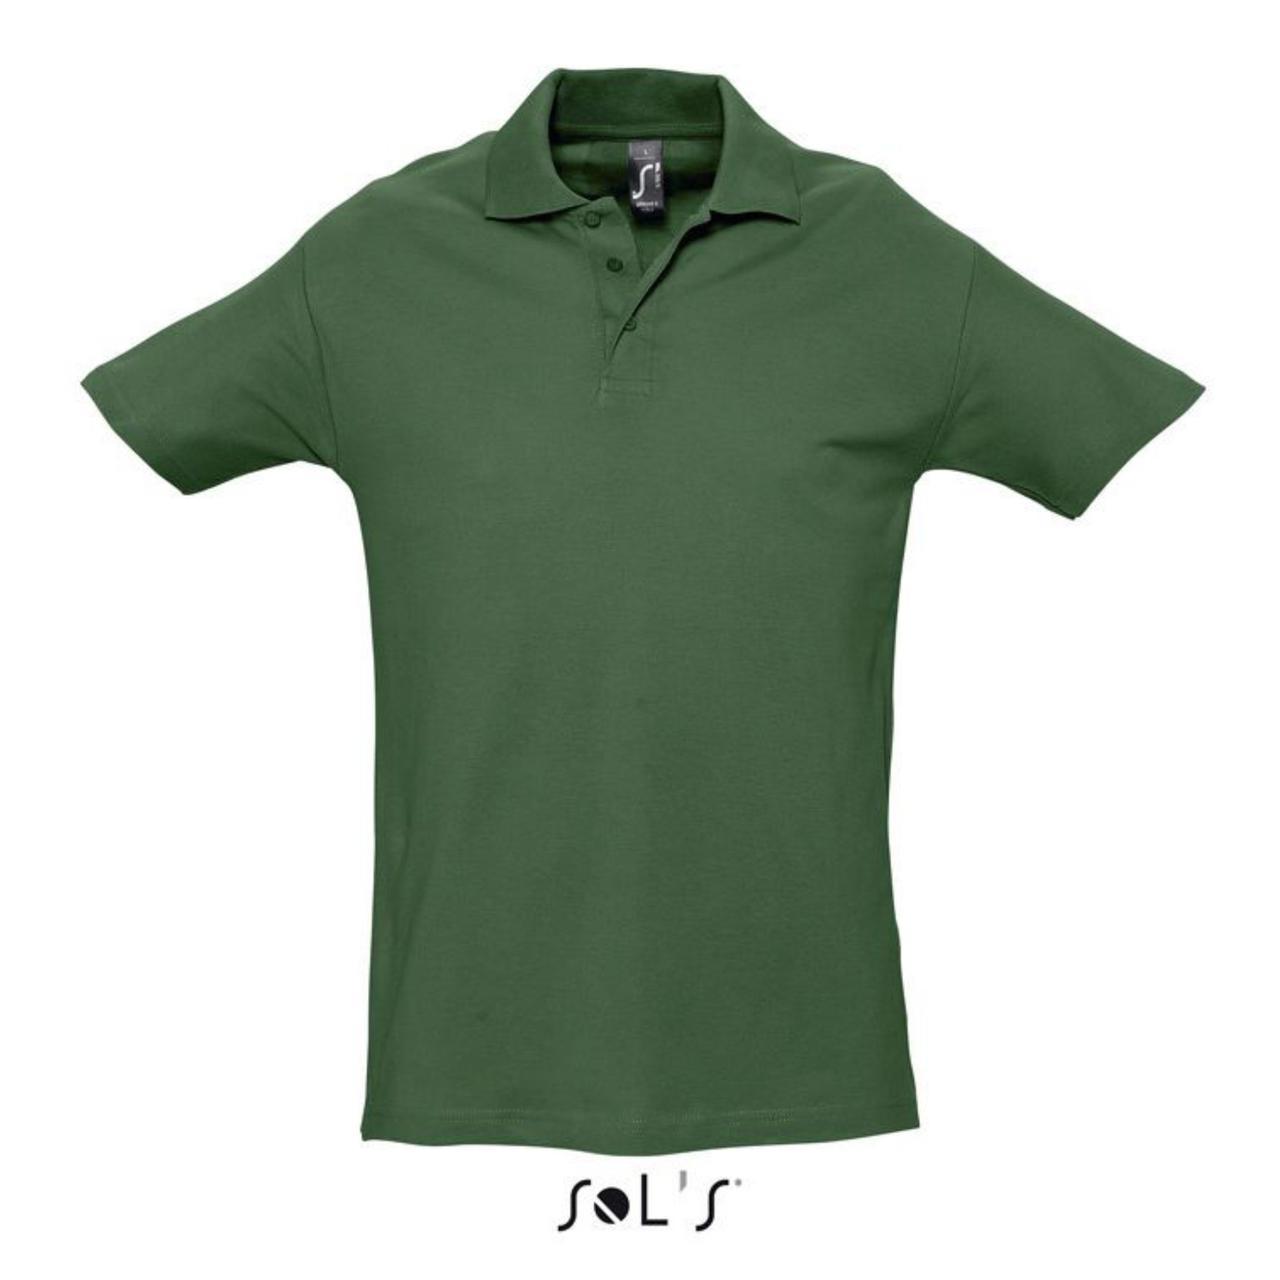 Рубашка поло SPRING II, цвет Golf green, размер XL